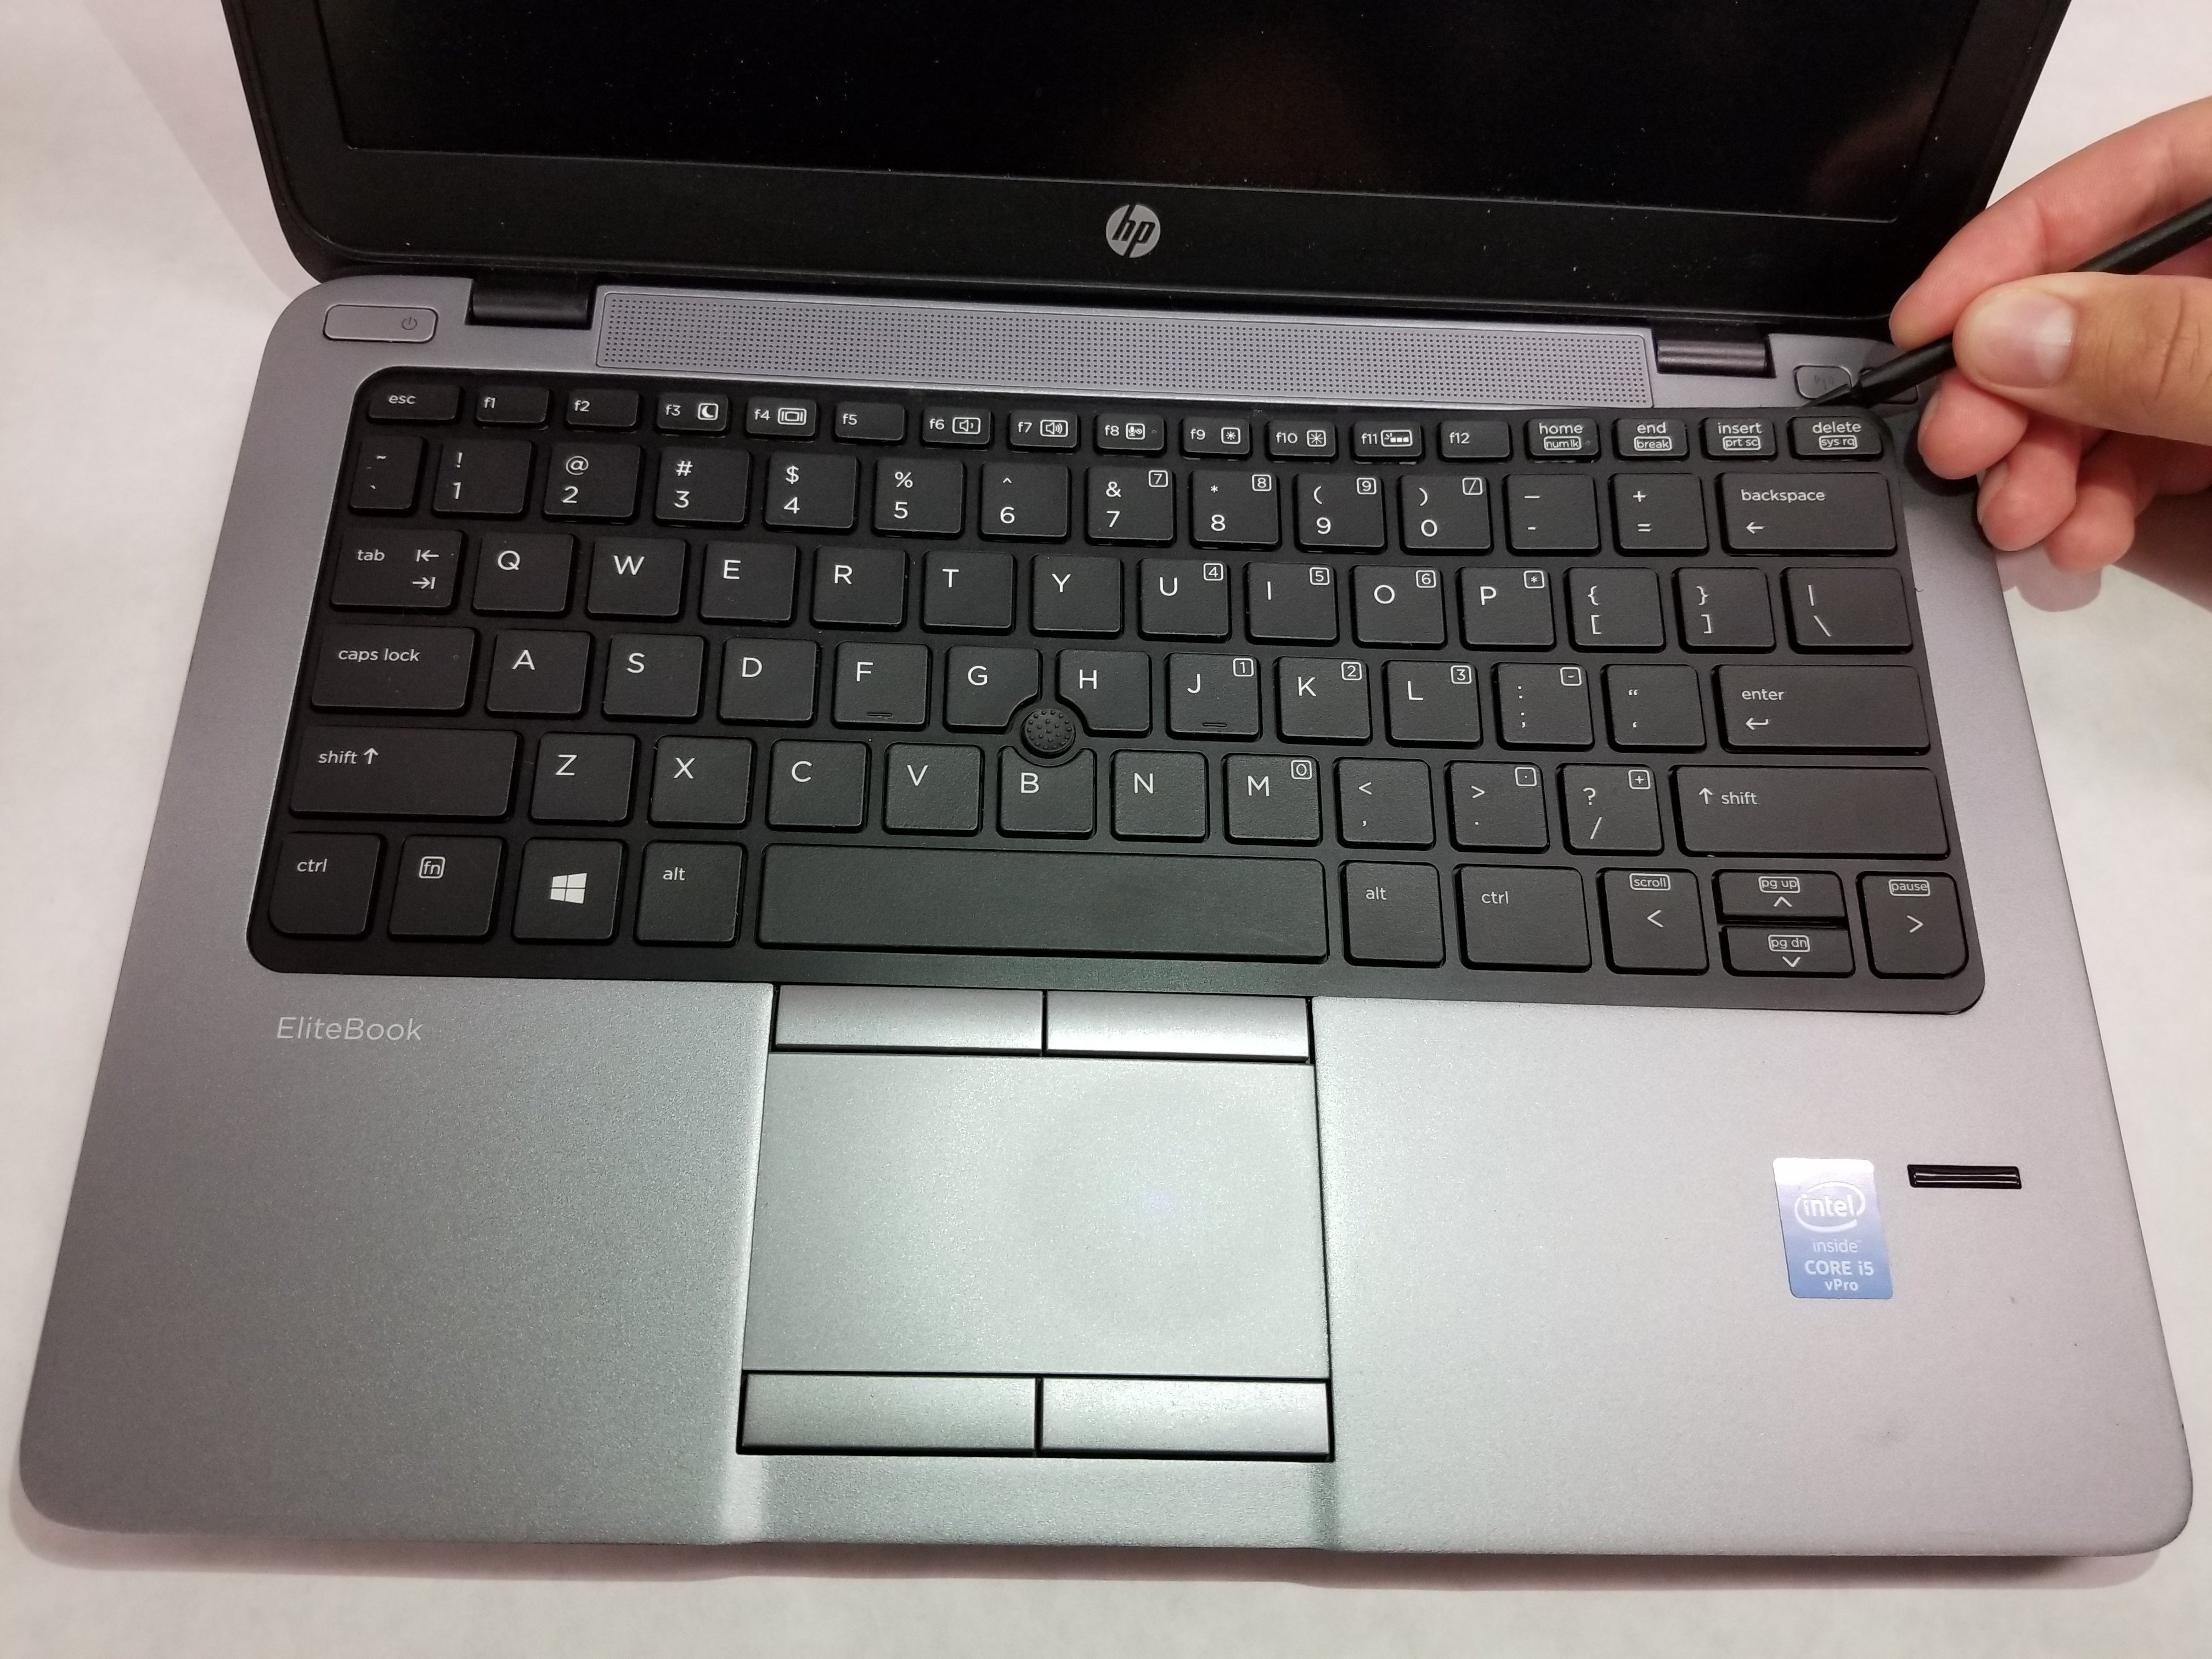 HP Elitebook 820 G1 Keyboard Replacement - iFixit Repair Guide